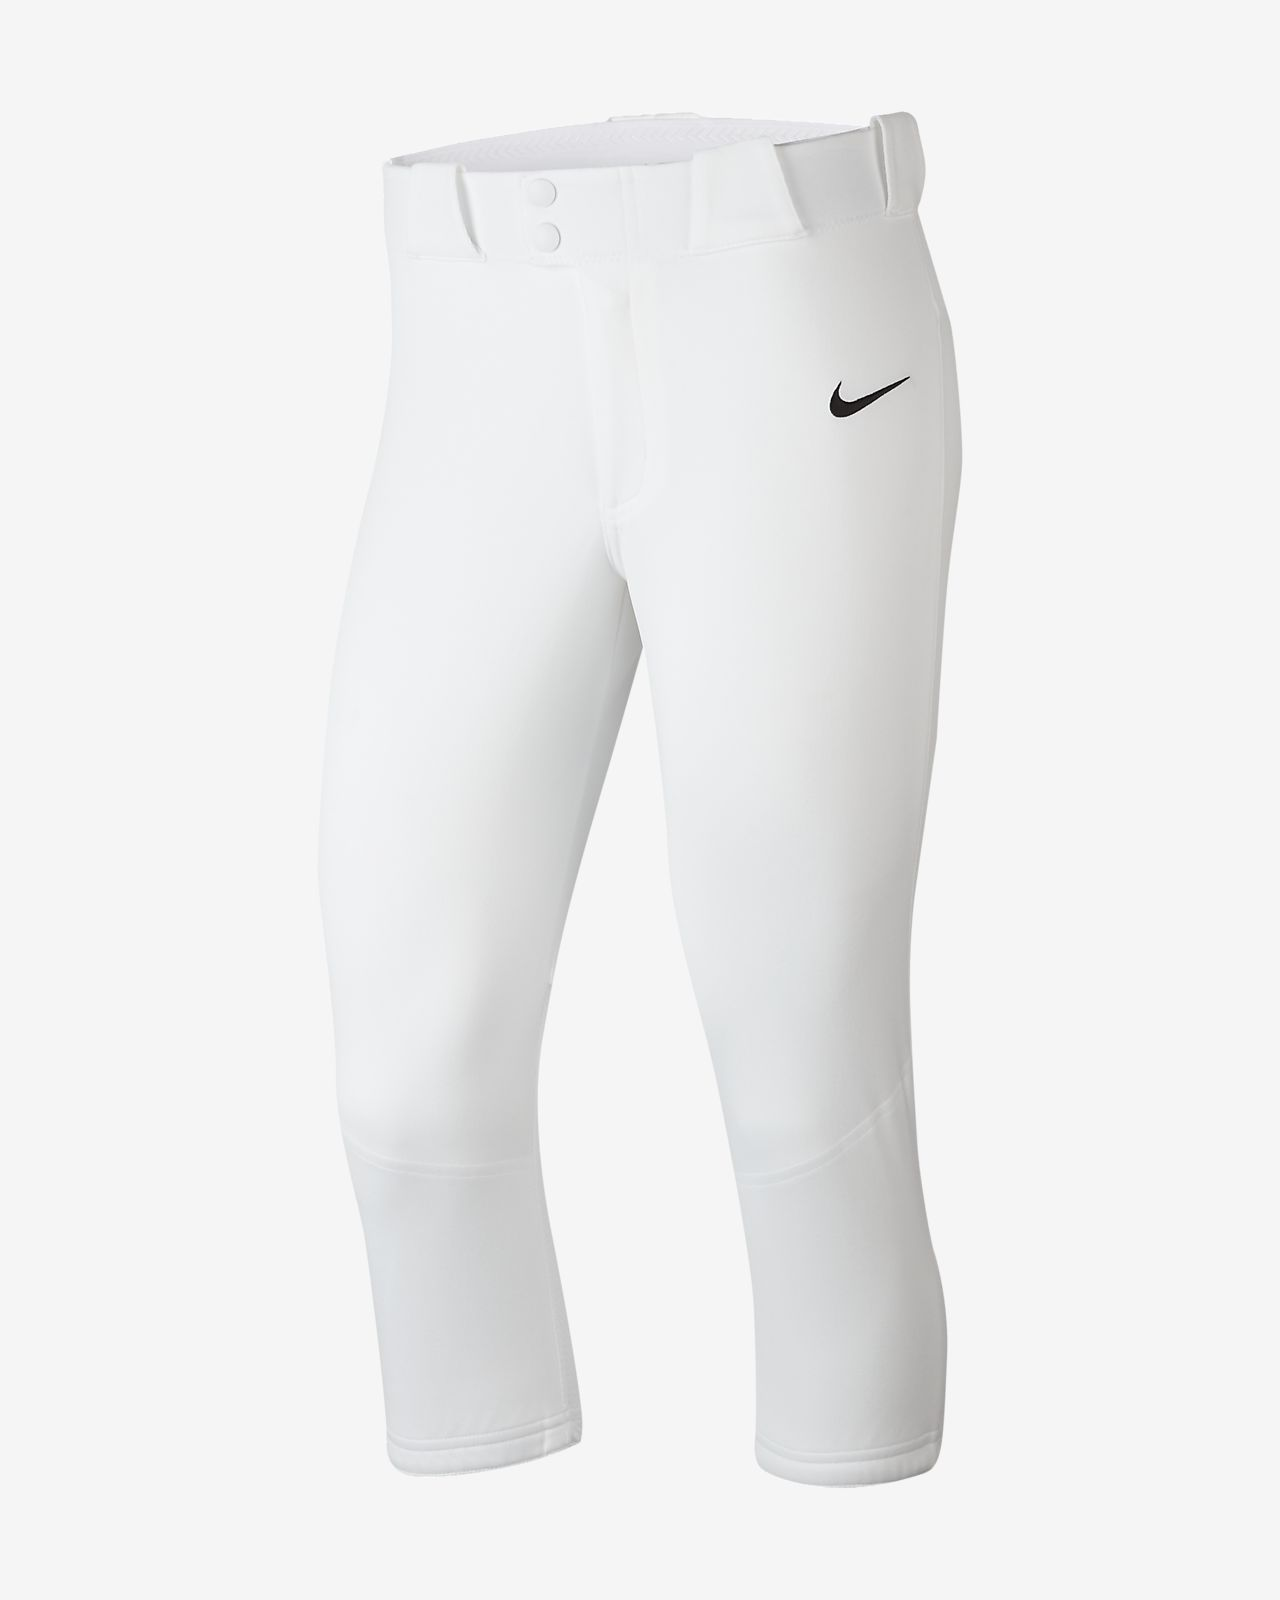 Nike Vapor Select Women's Softball Pants